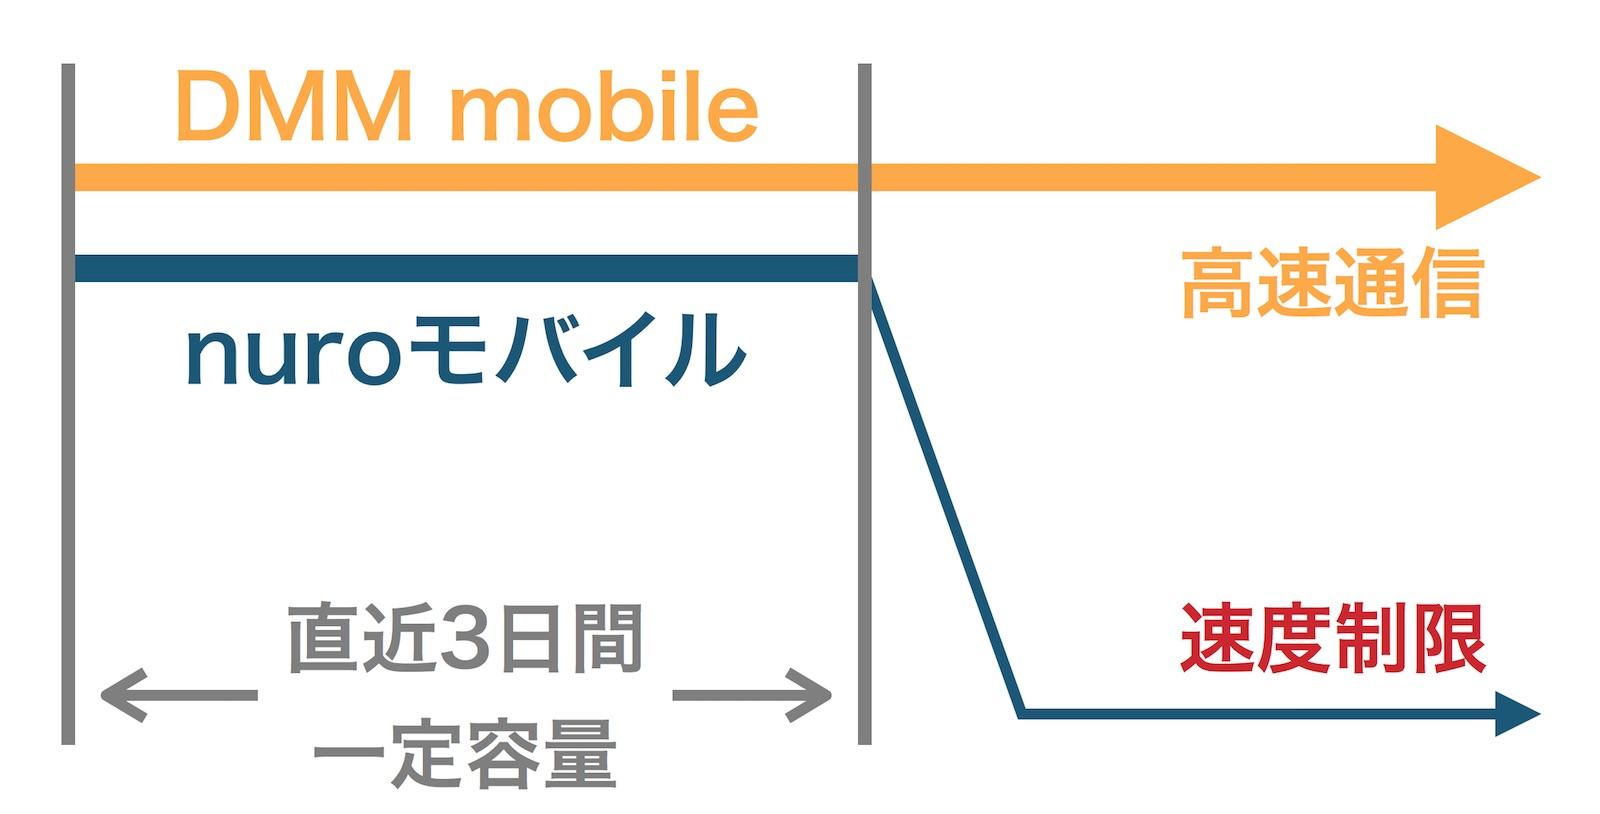 nuroモバイル DMM mobile 3日間 速度制限